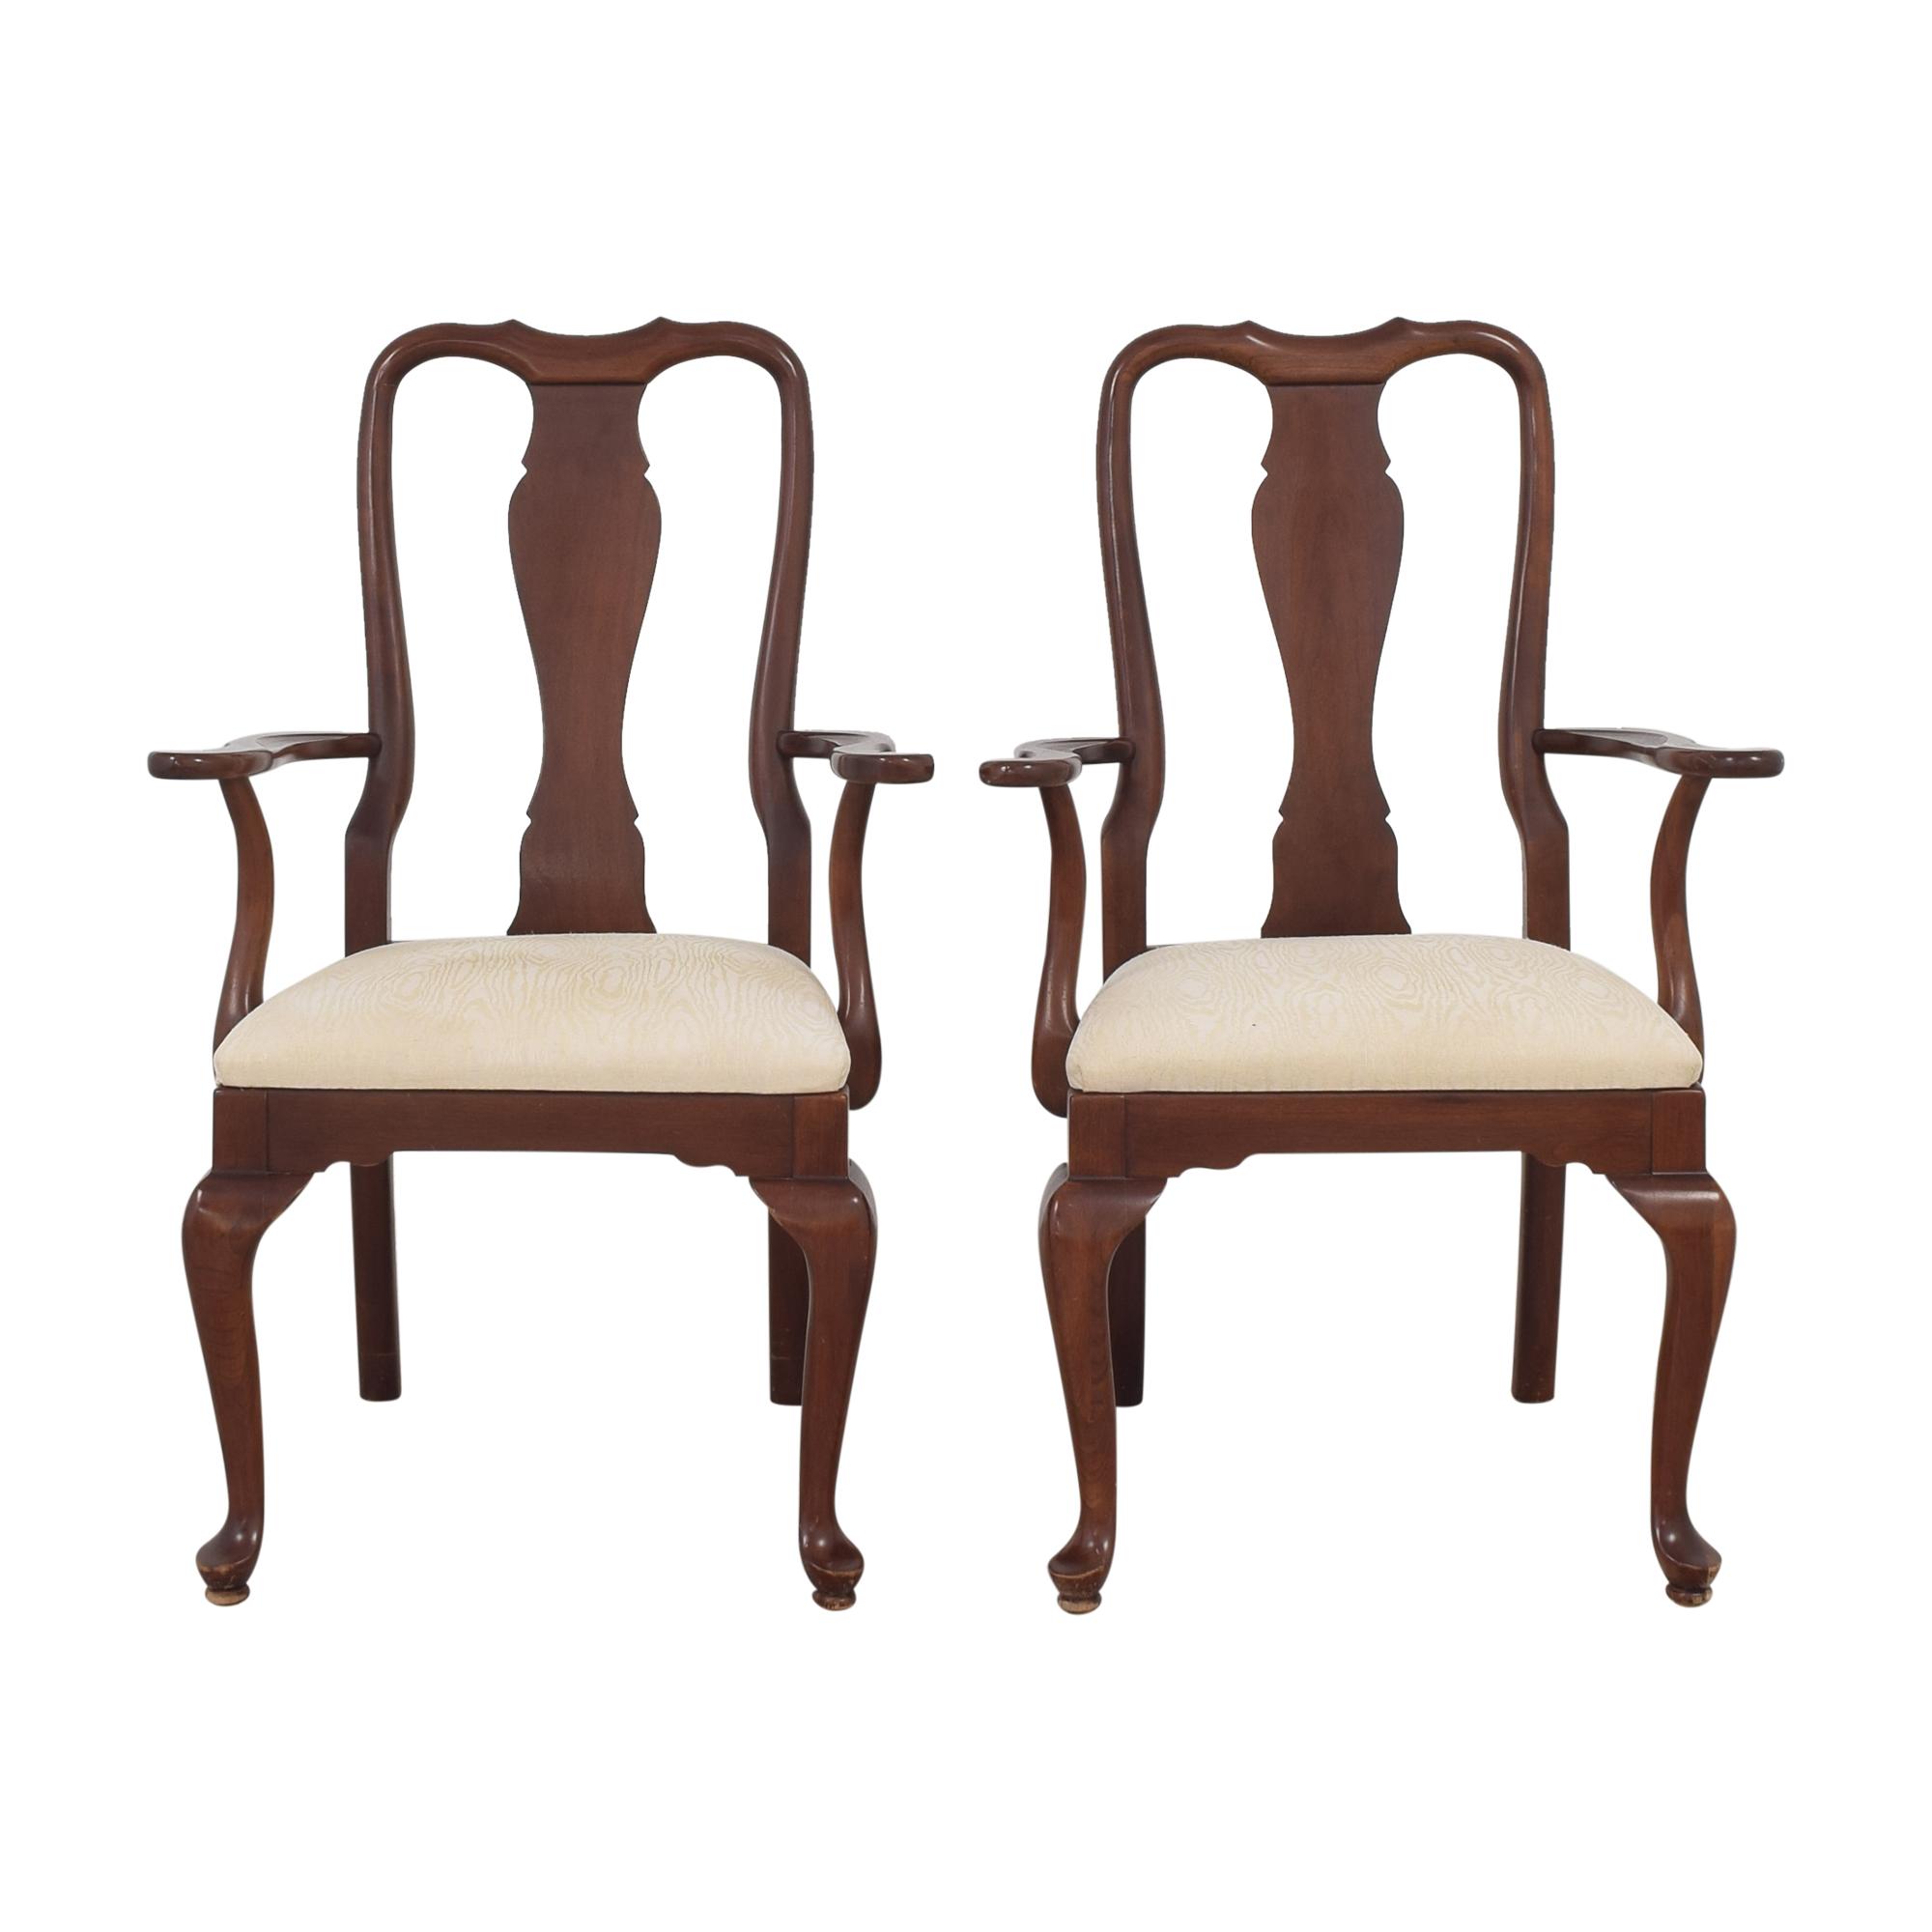 buy Knob Creek Penn Manor Dining Arm Chairs Knob Creek